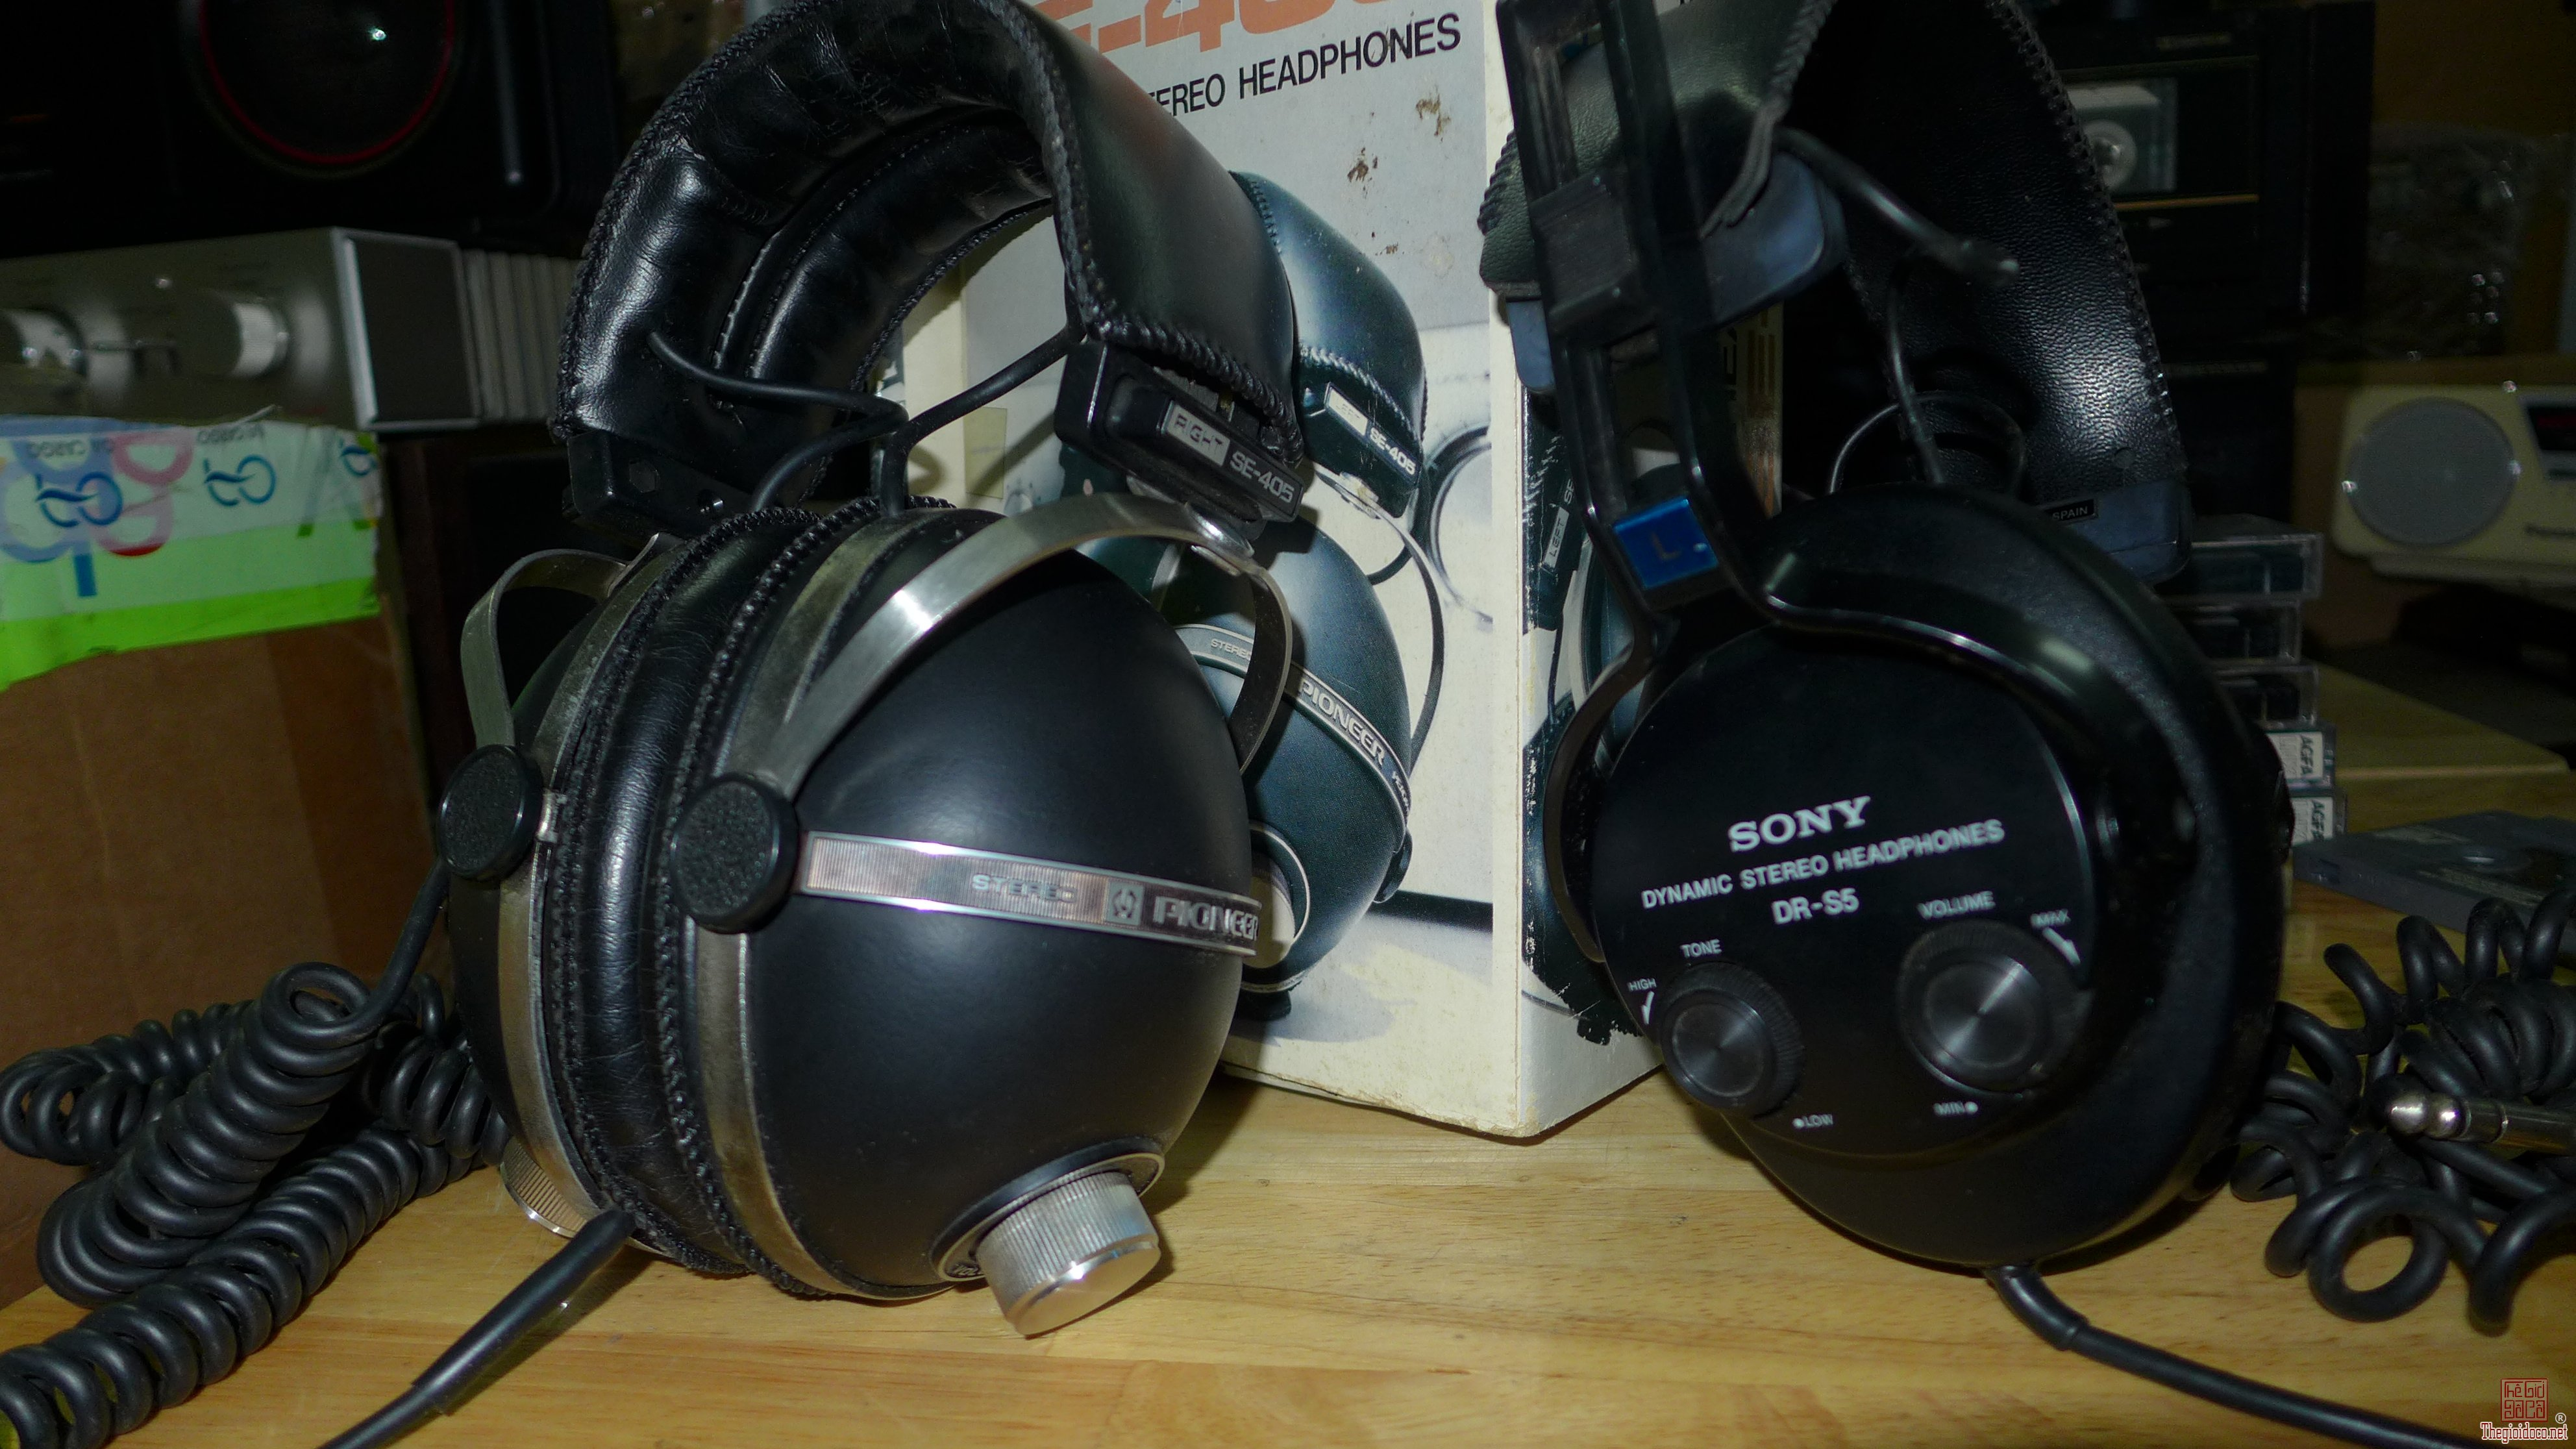 HCM - Quận 10 - Bán headphone Pionner SE-405 và Sony DR-S5